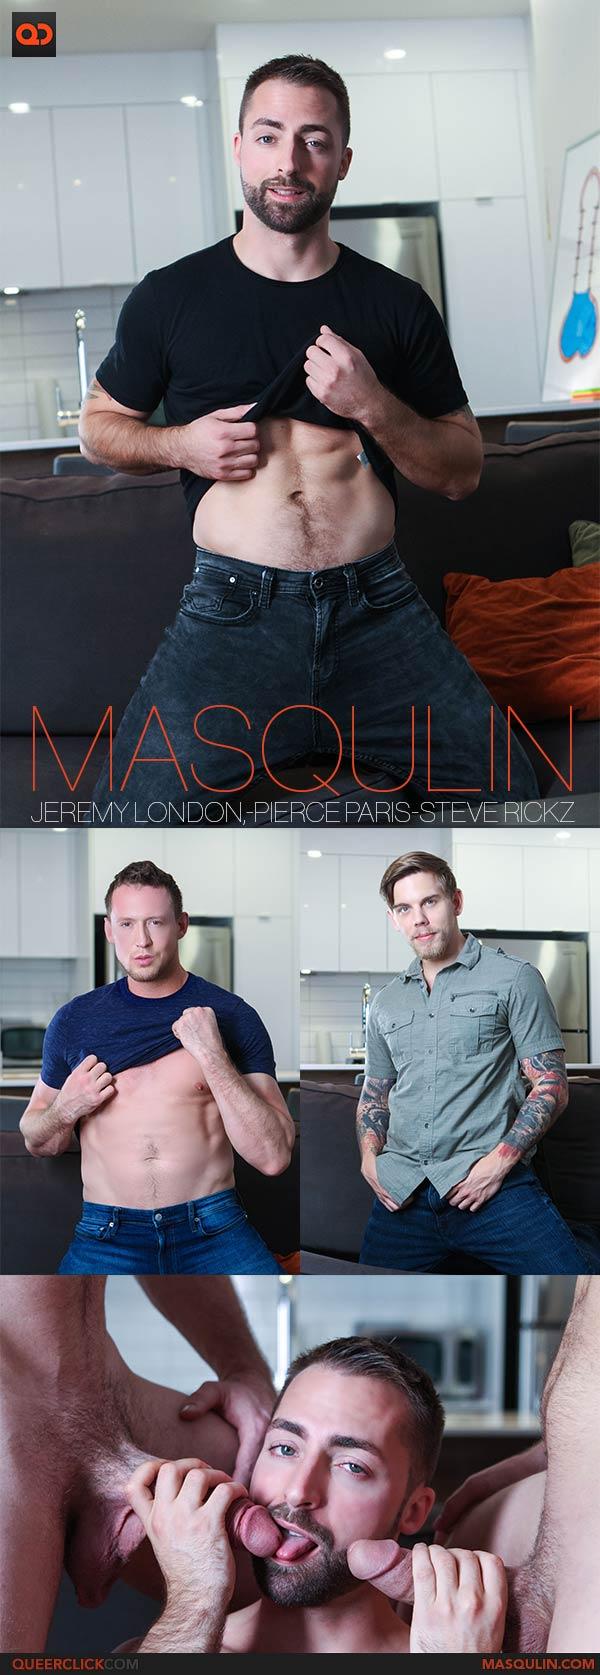 Masqulin: Jeremy London, Pierce Paris and Steve Rick